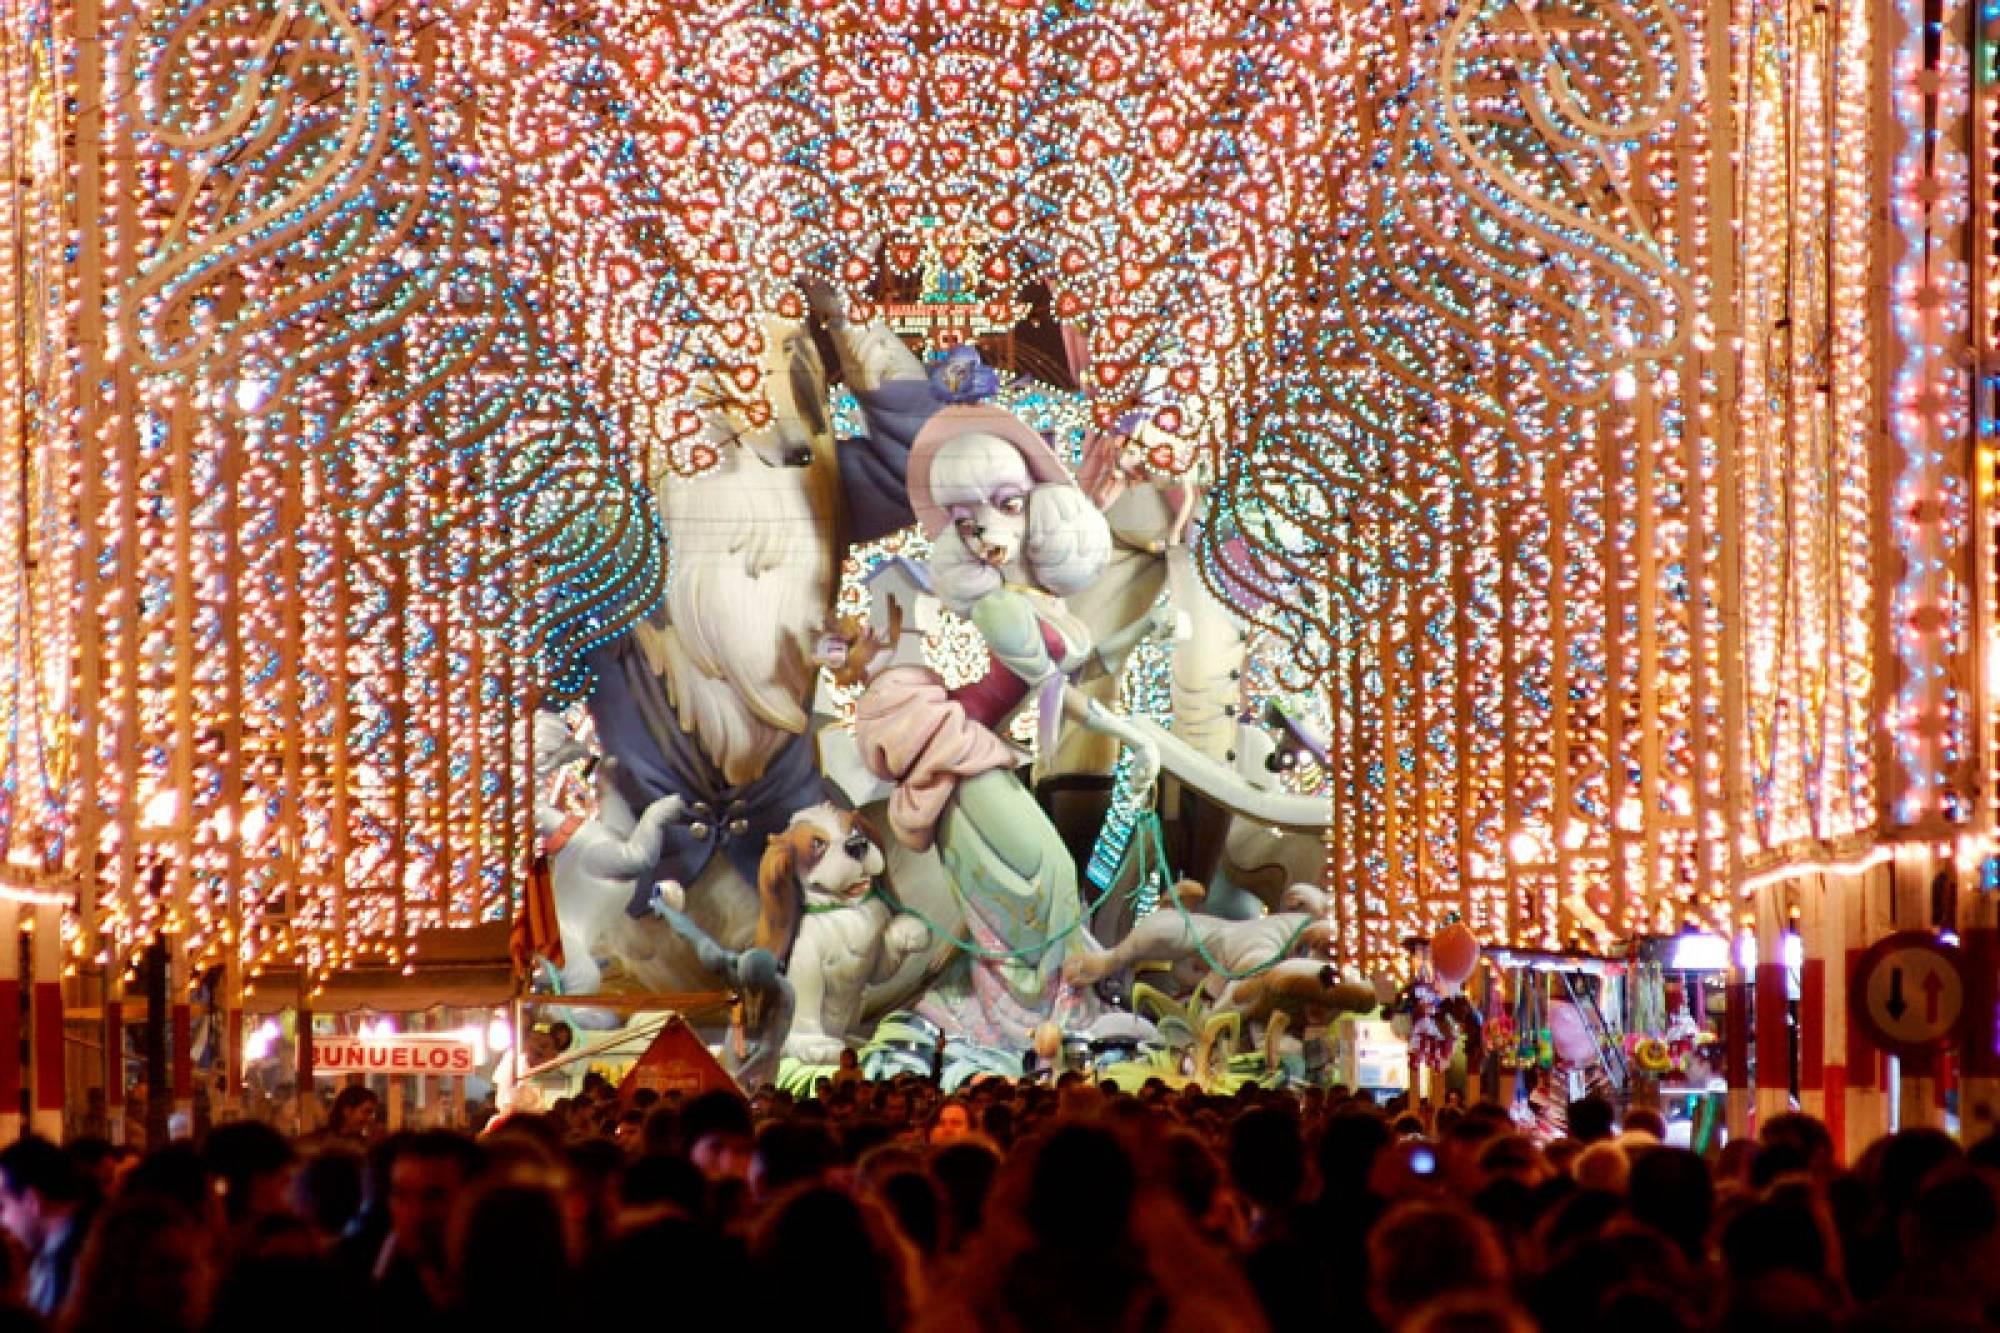 جشنواره لاس فالاس والنسیا